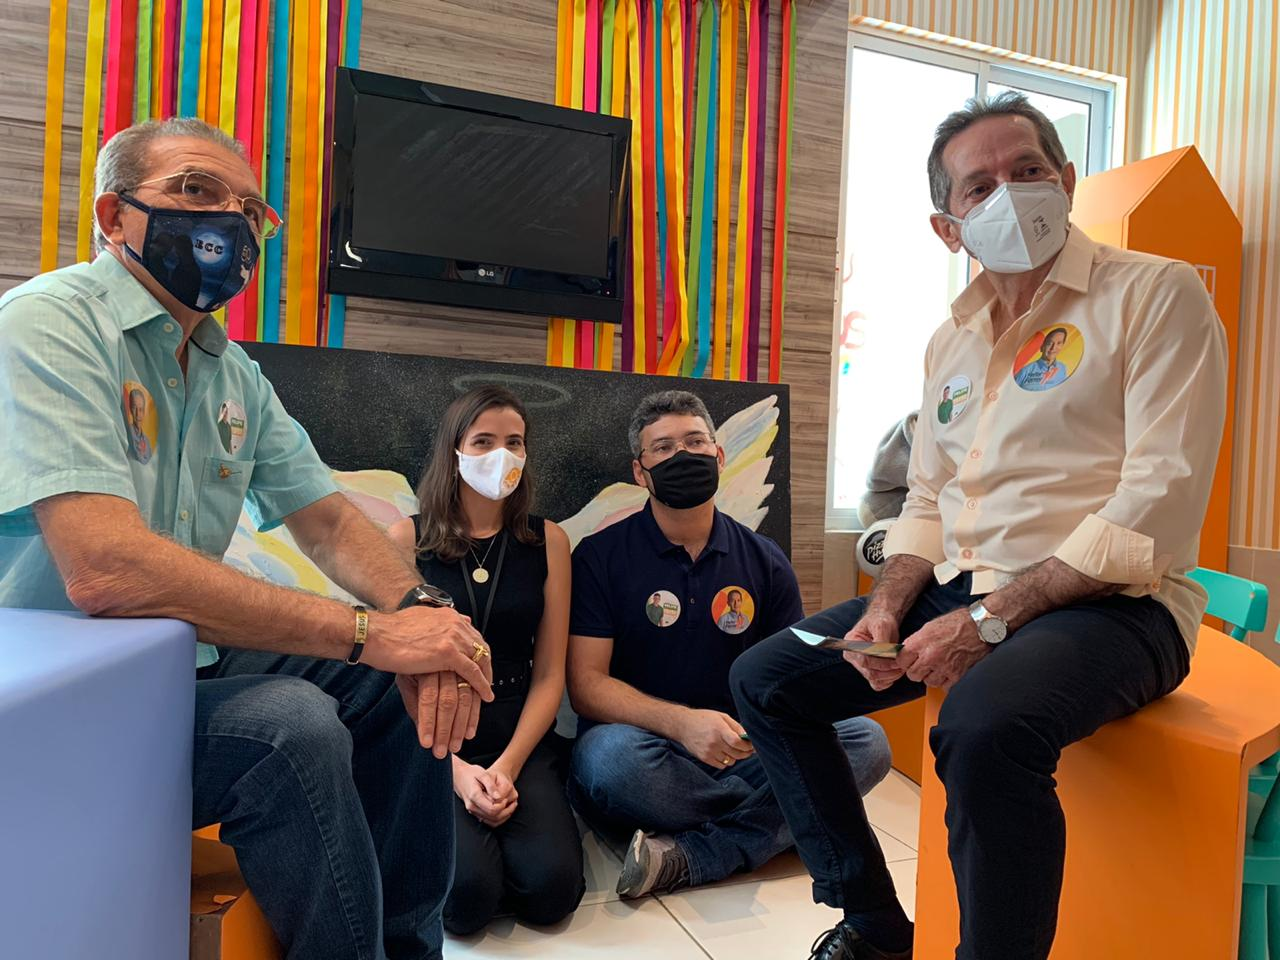 Heitor Férrer visita entidade de combate à cegueira infantil e destaca programa 'Volte a Enxergar'